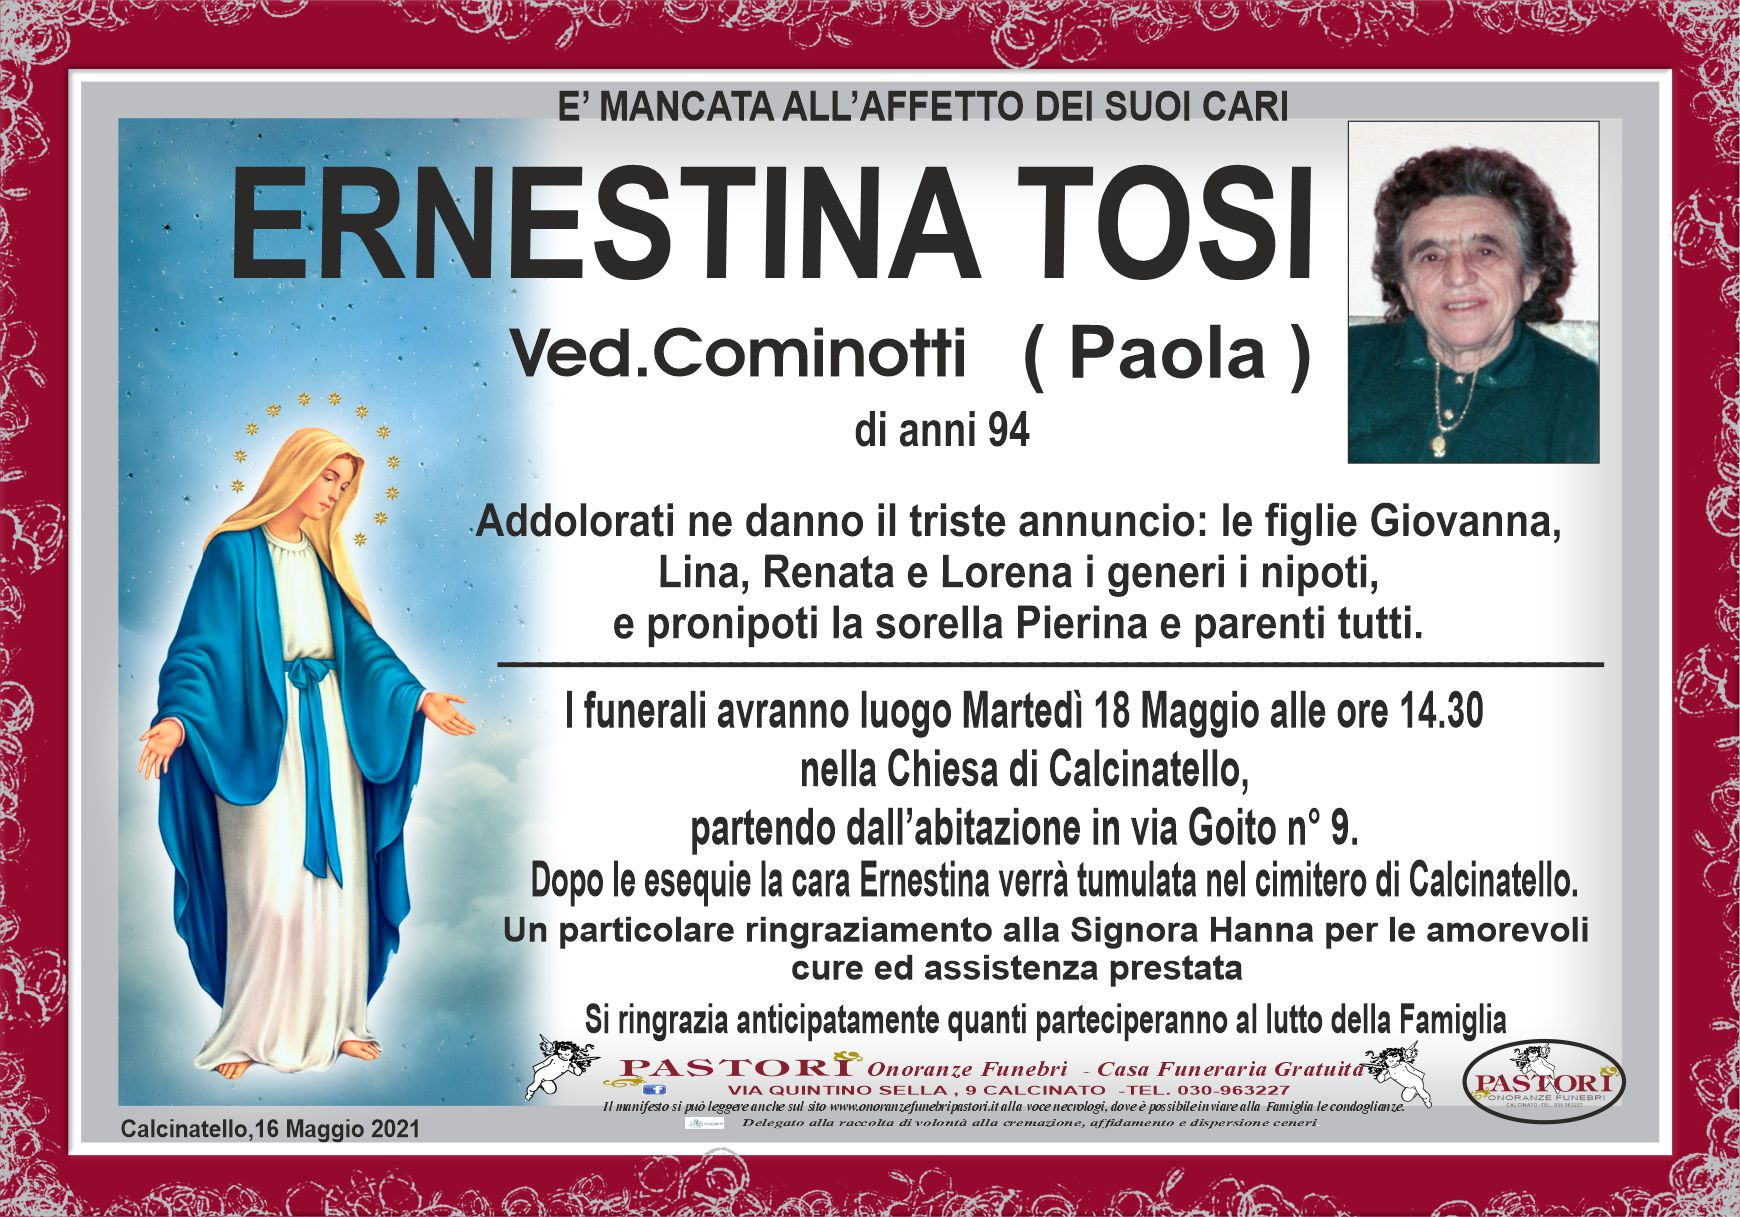 Ernestina Tosi